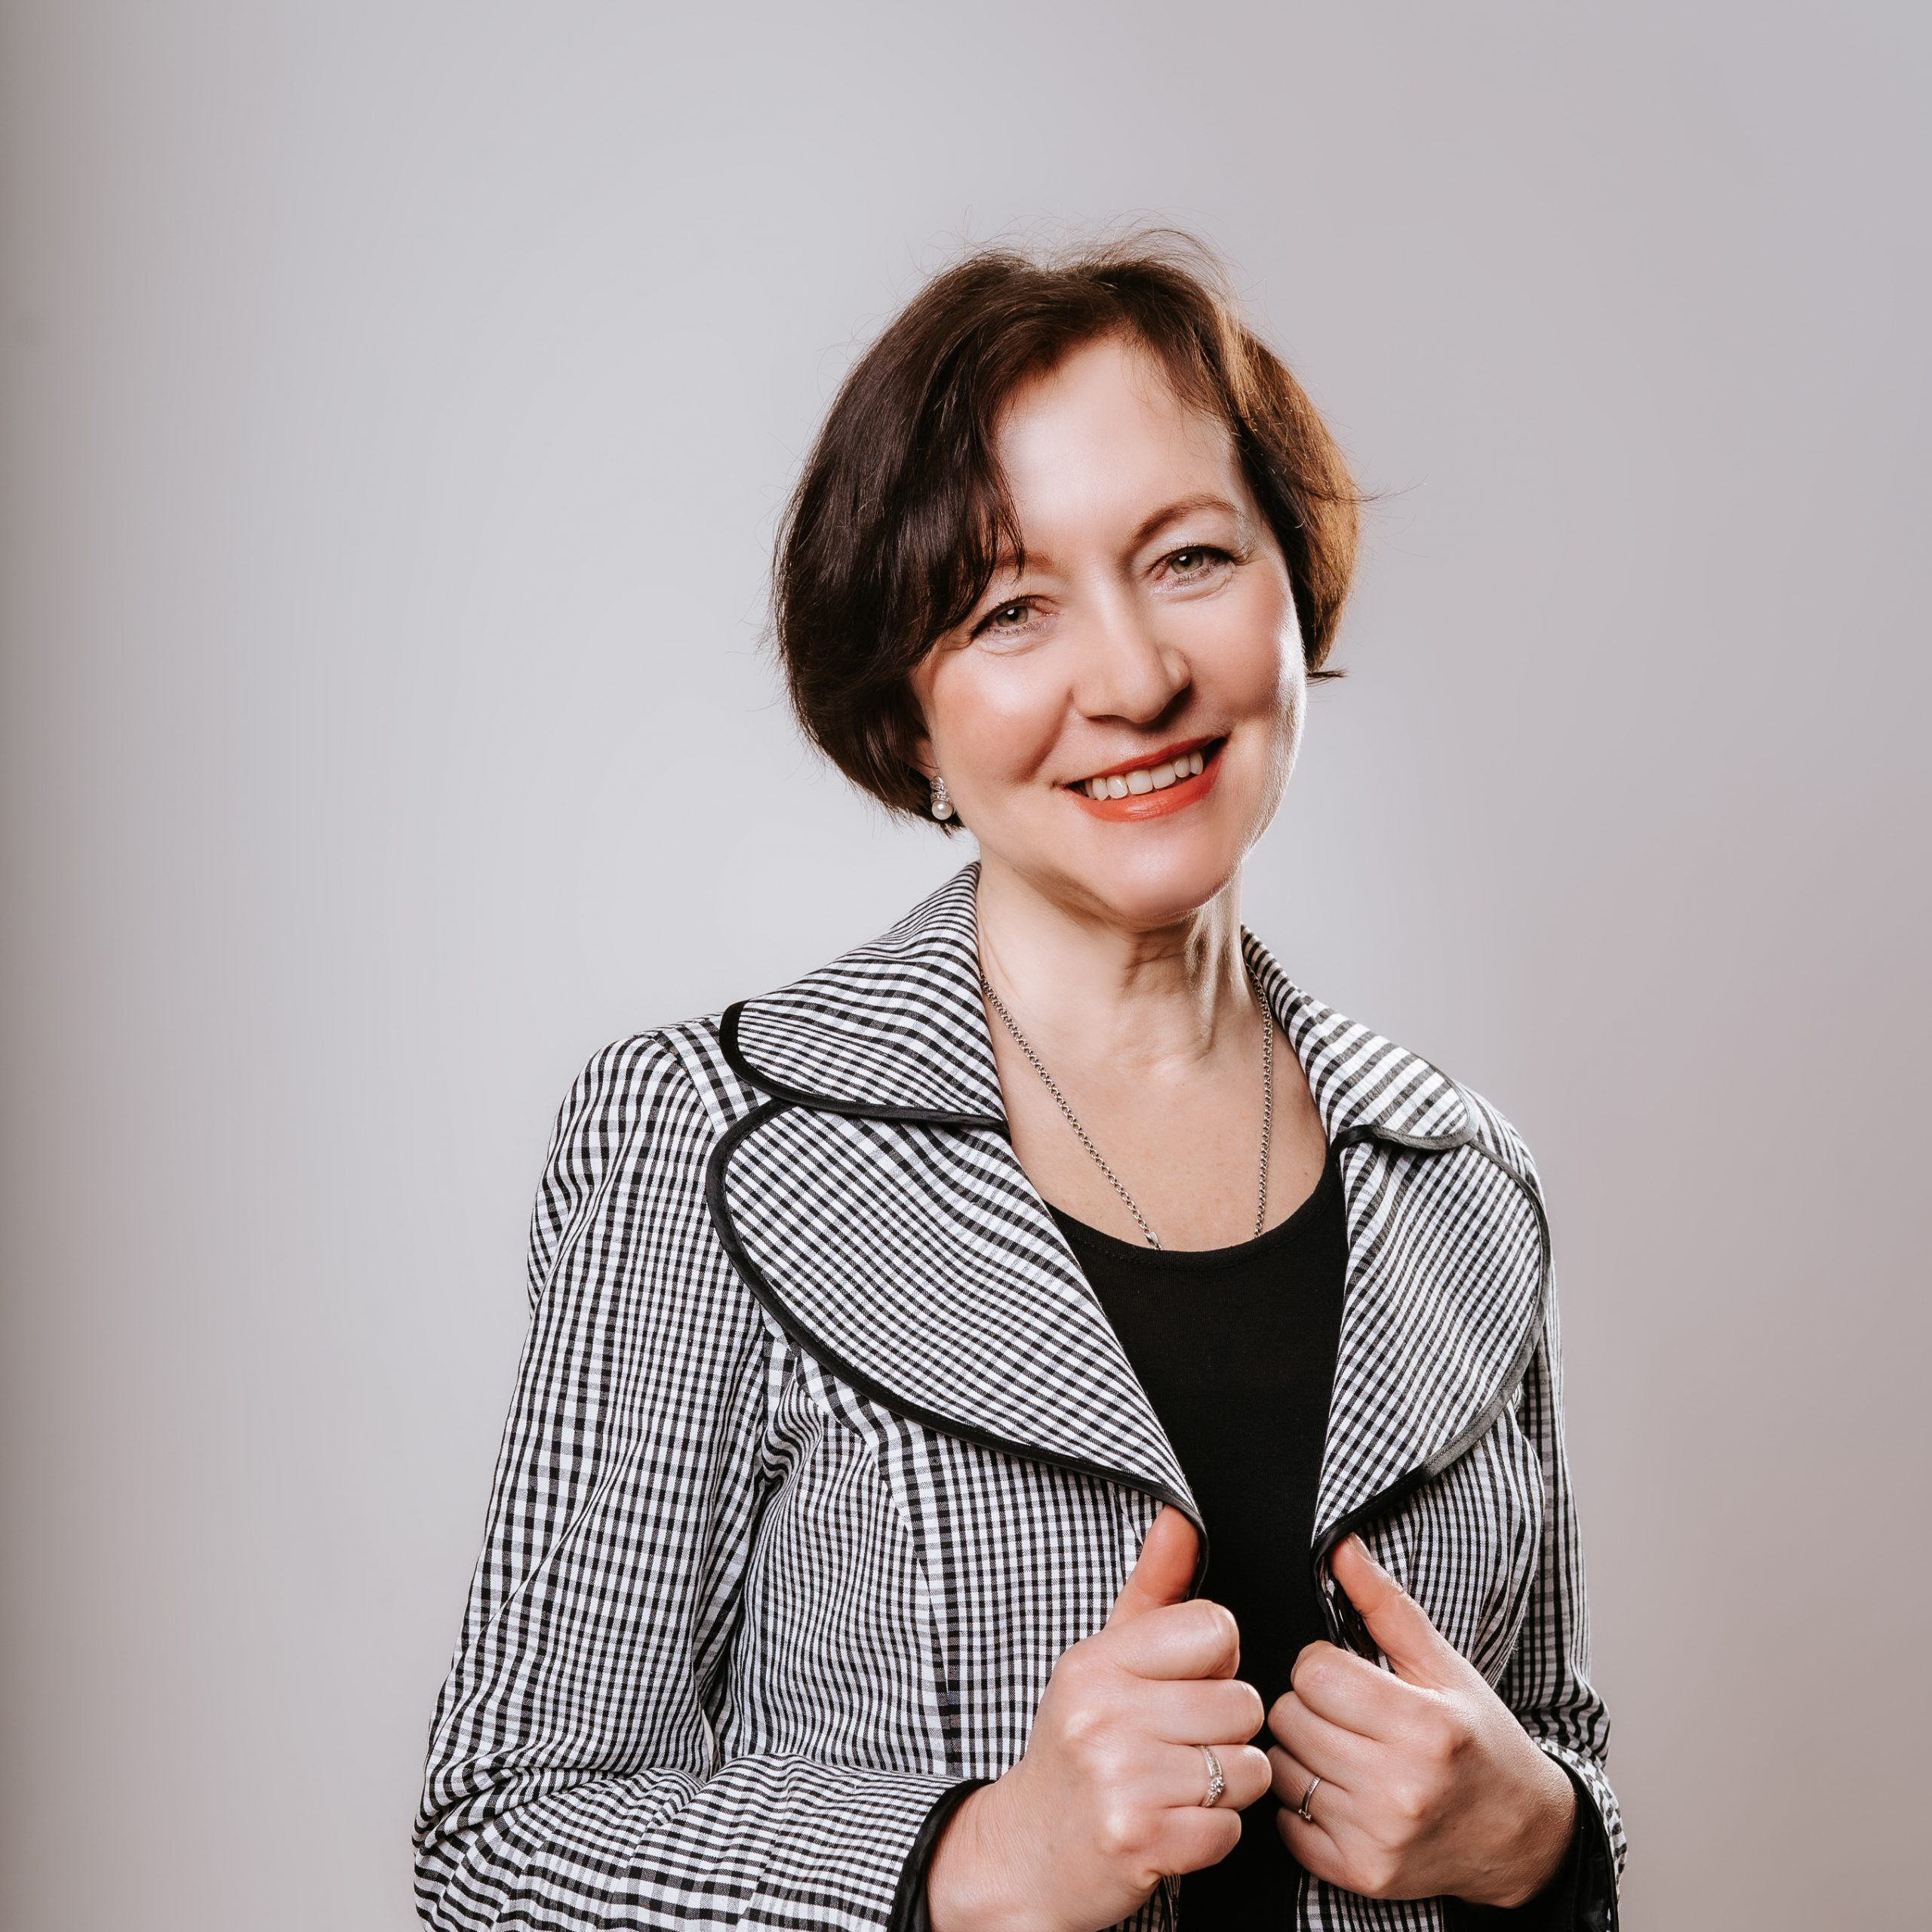 Зоя Гавриловна Дмитренко